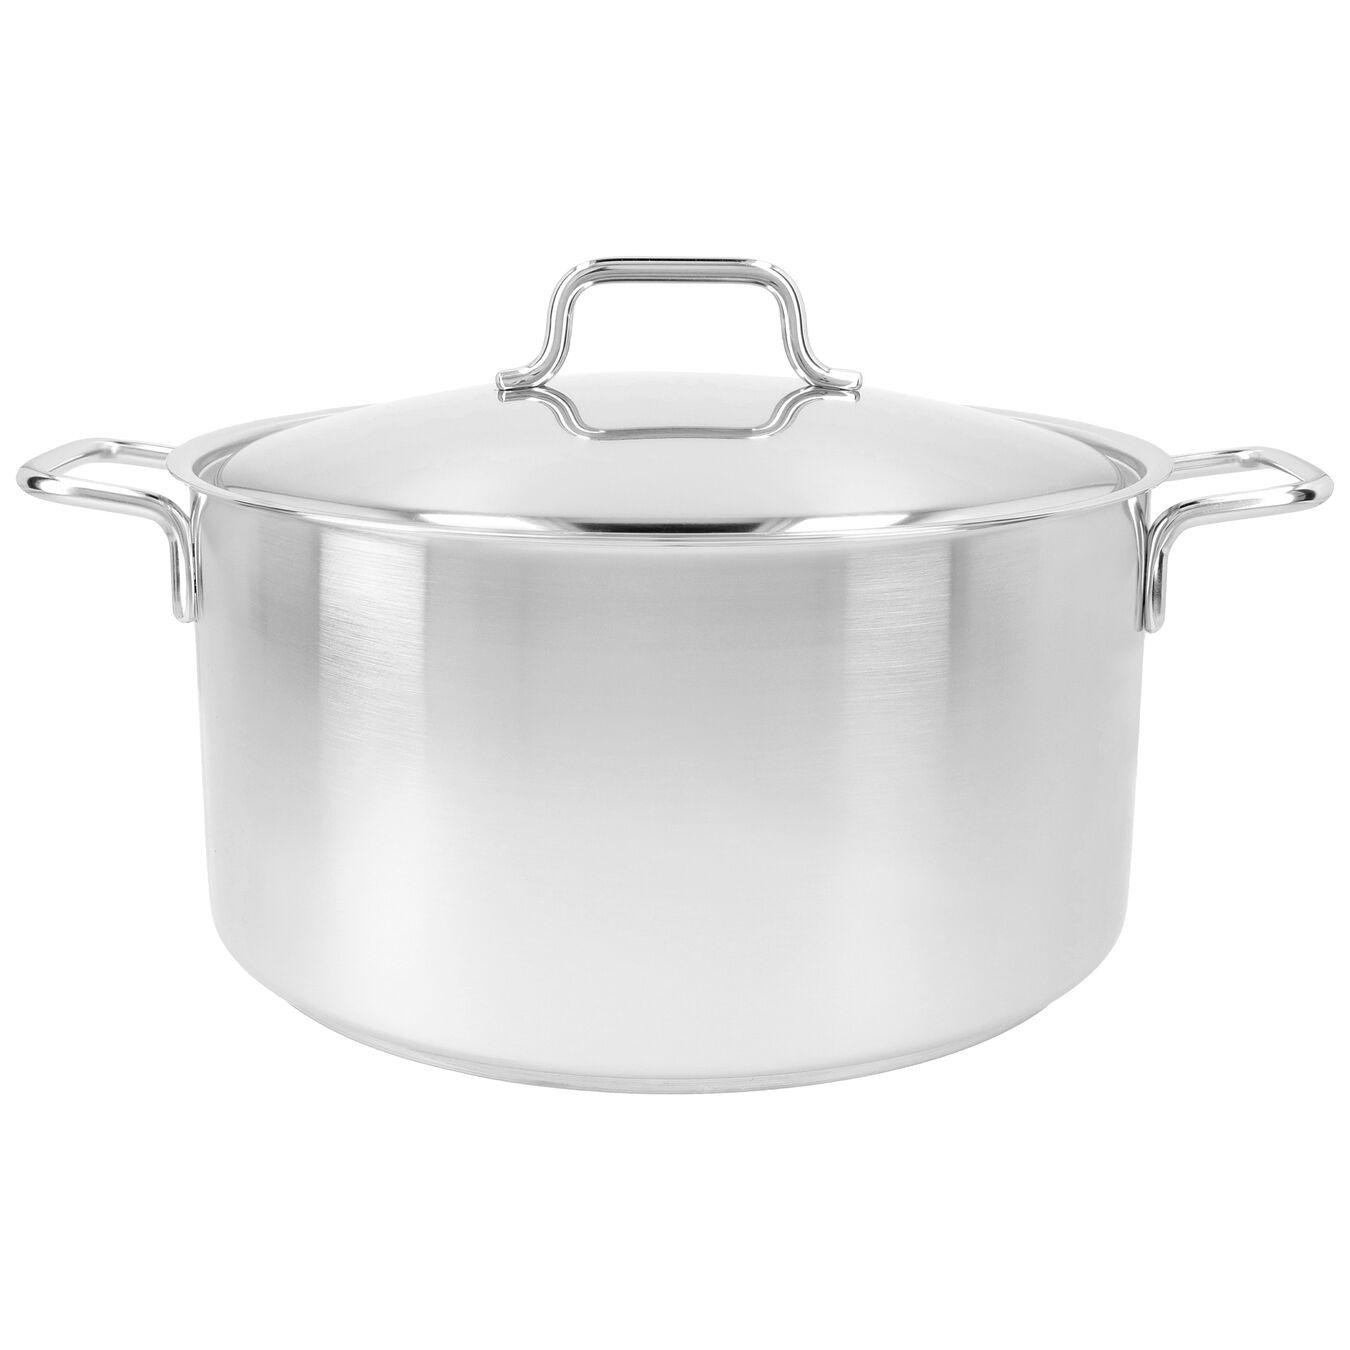 Kookpot met deksel 28 cm / 8,4 l,,large 1